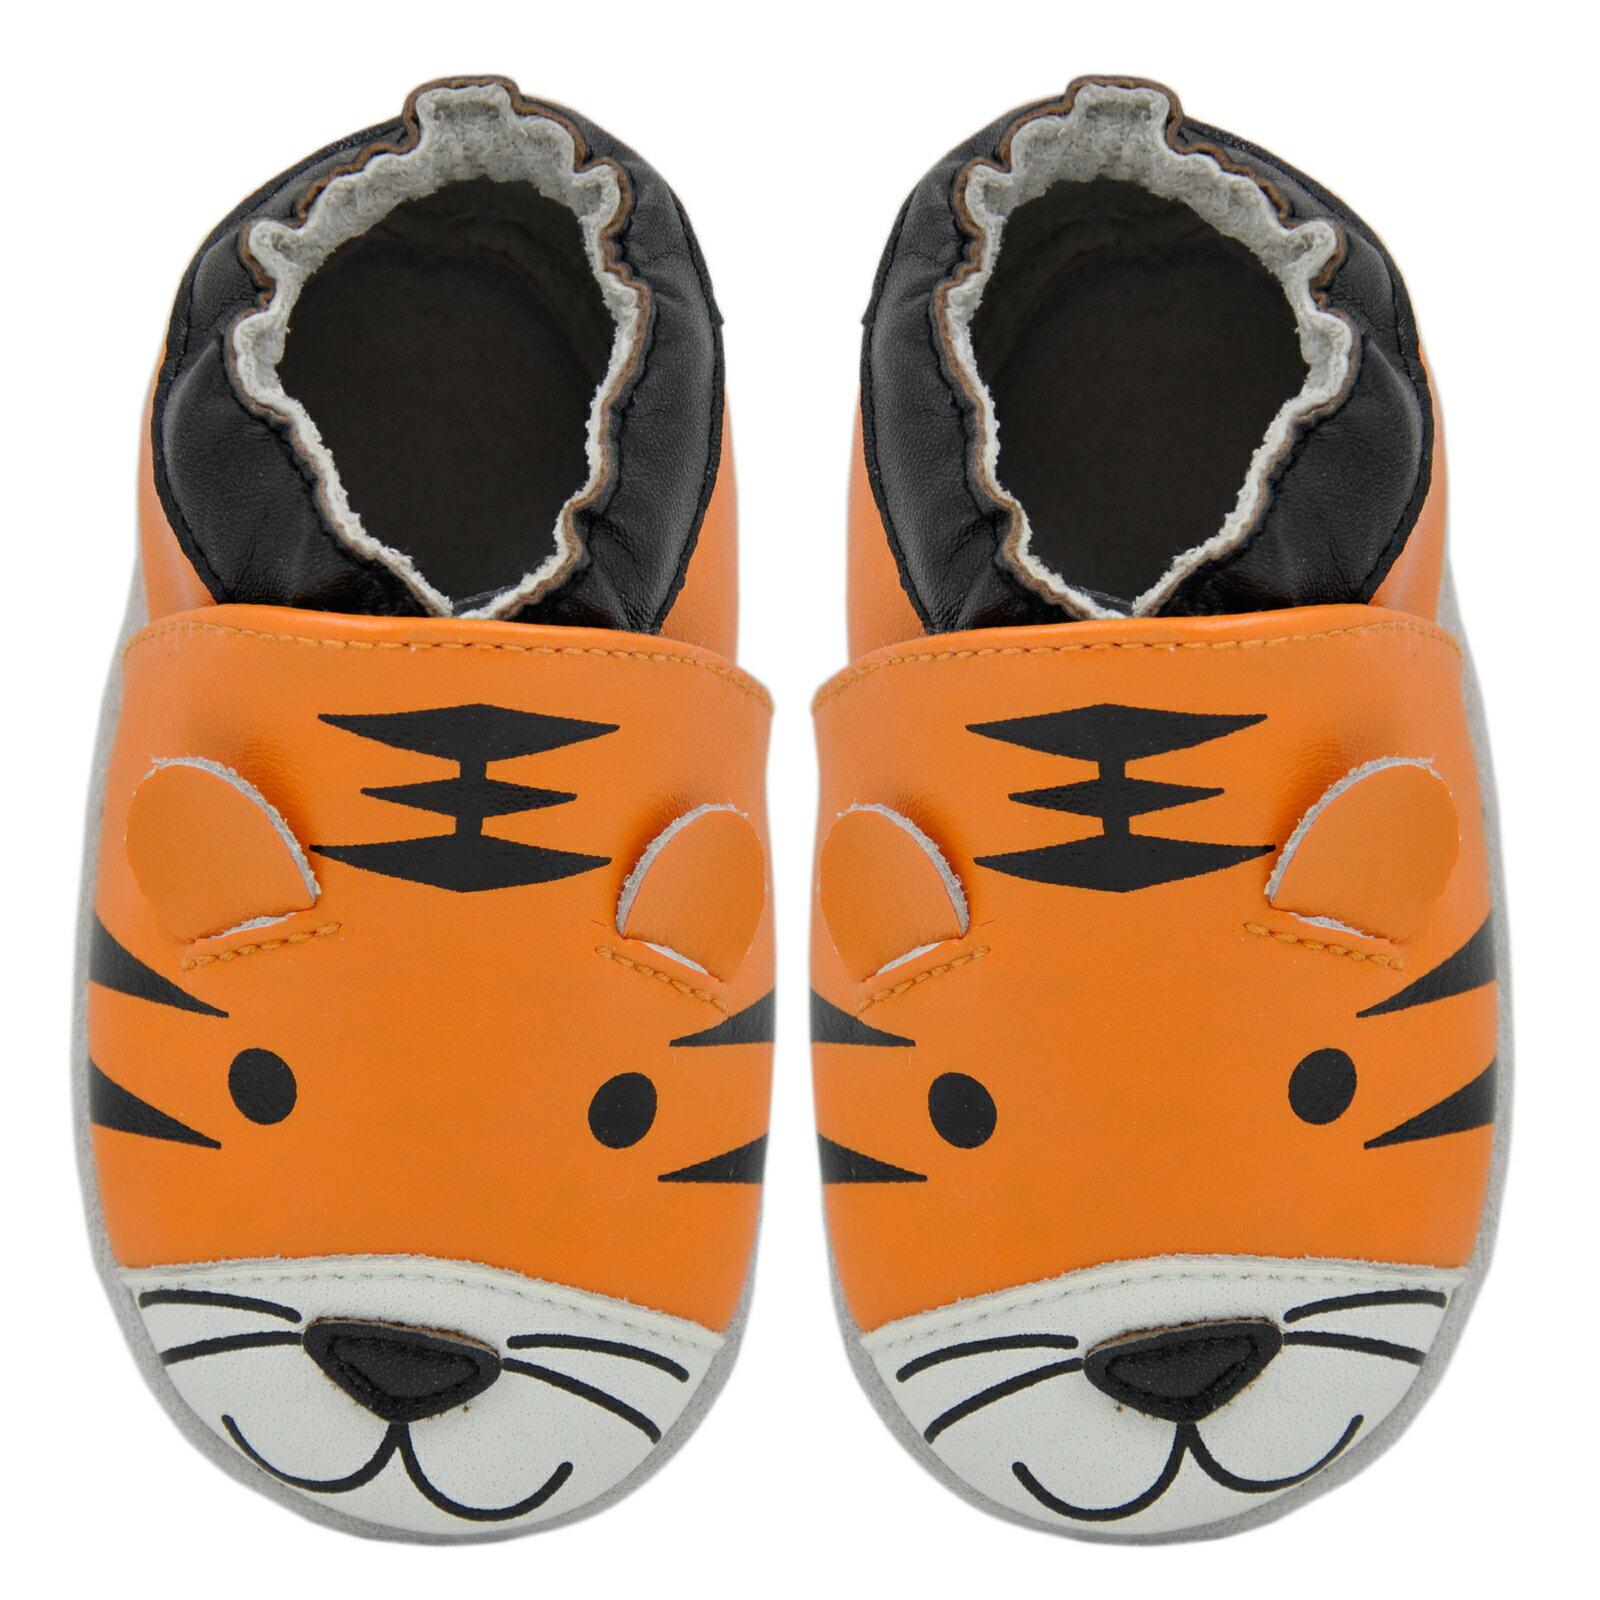 3ef2971b017c1 Kimi + Kai Baby Soft Sole Leather Crib Shoes - Tiger